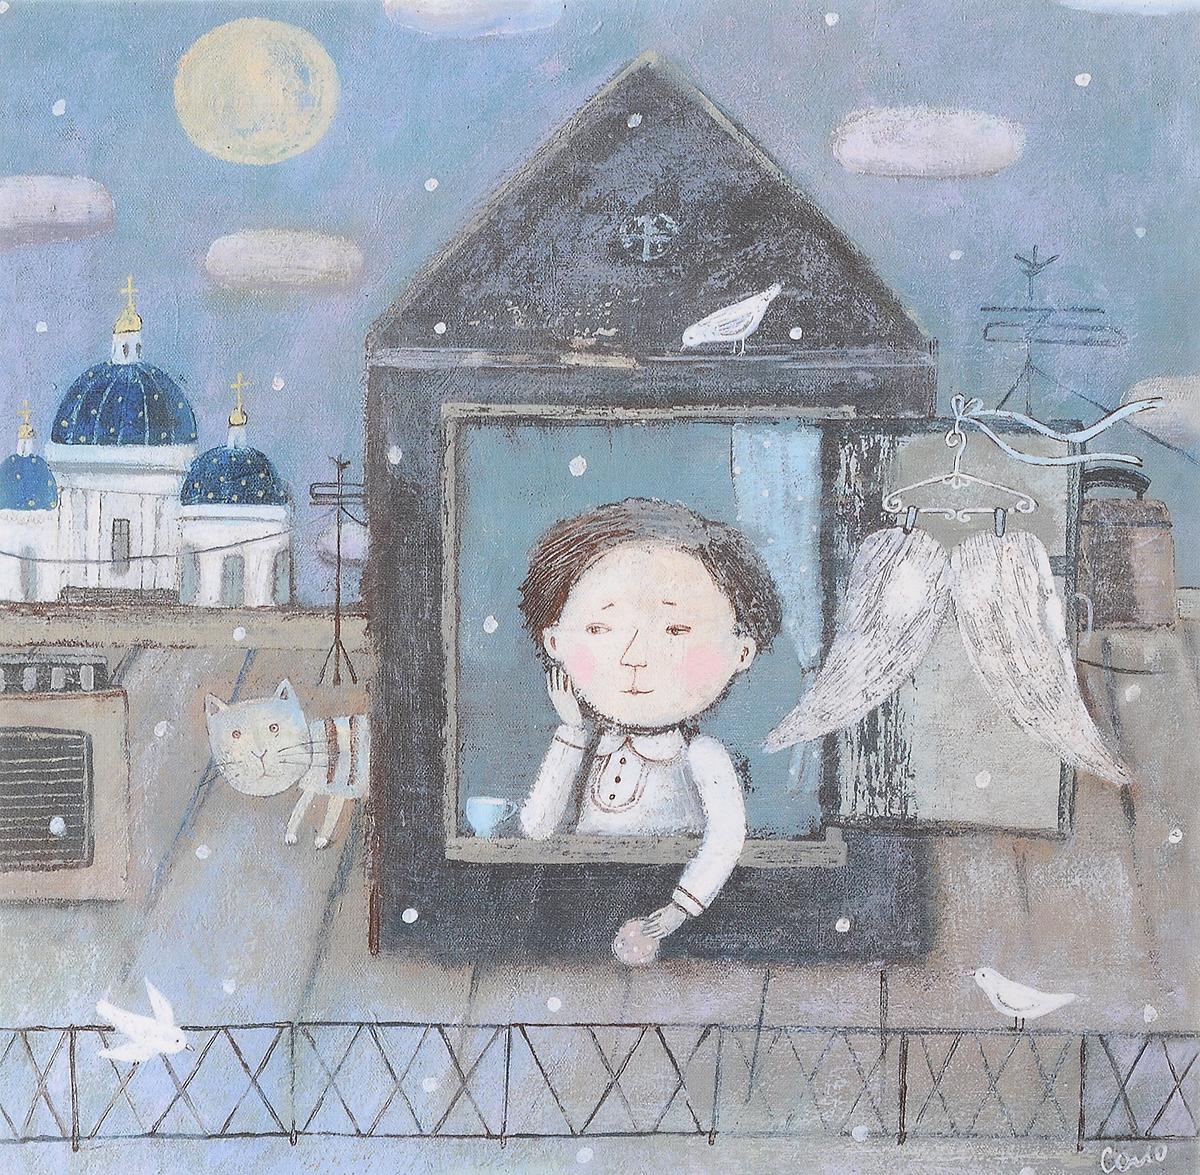 Открытка Кис-кис-кис. Автор: Соловьева Светлана открытка питерские пышечки автор светлана соловьева